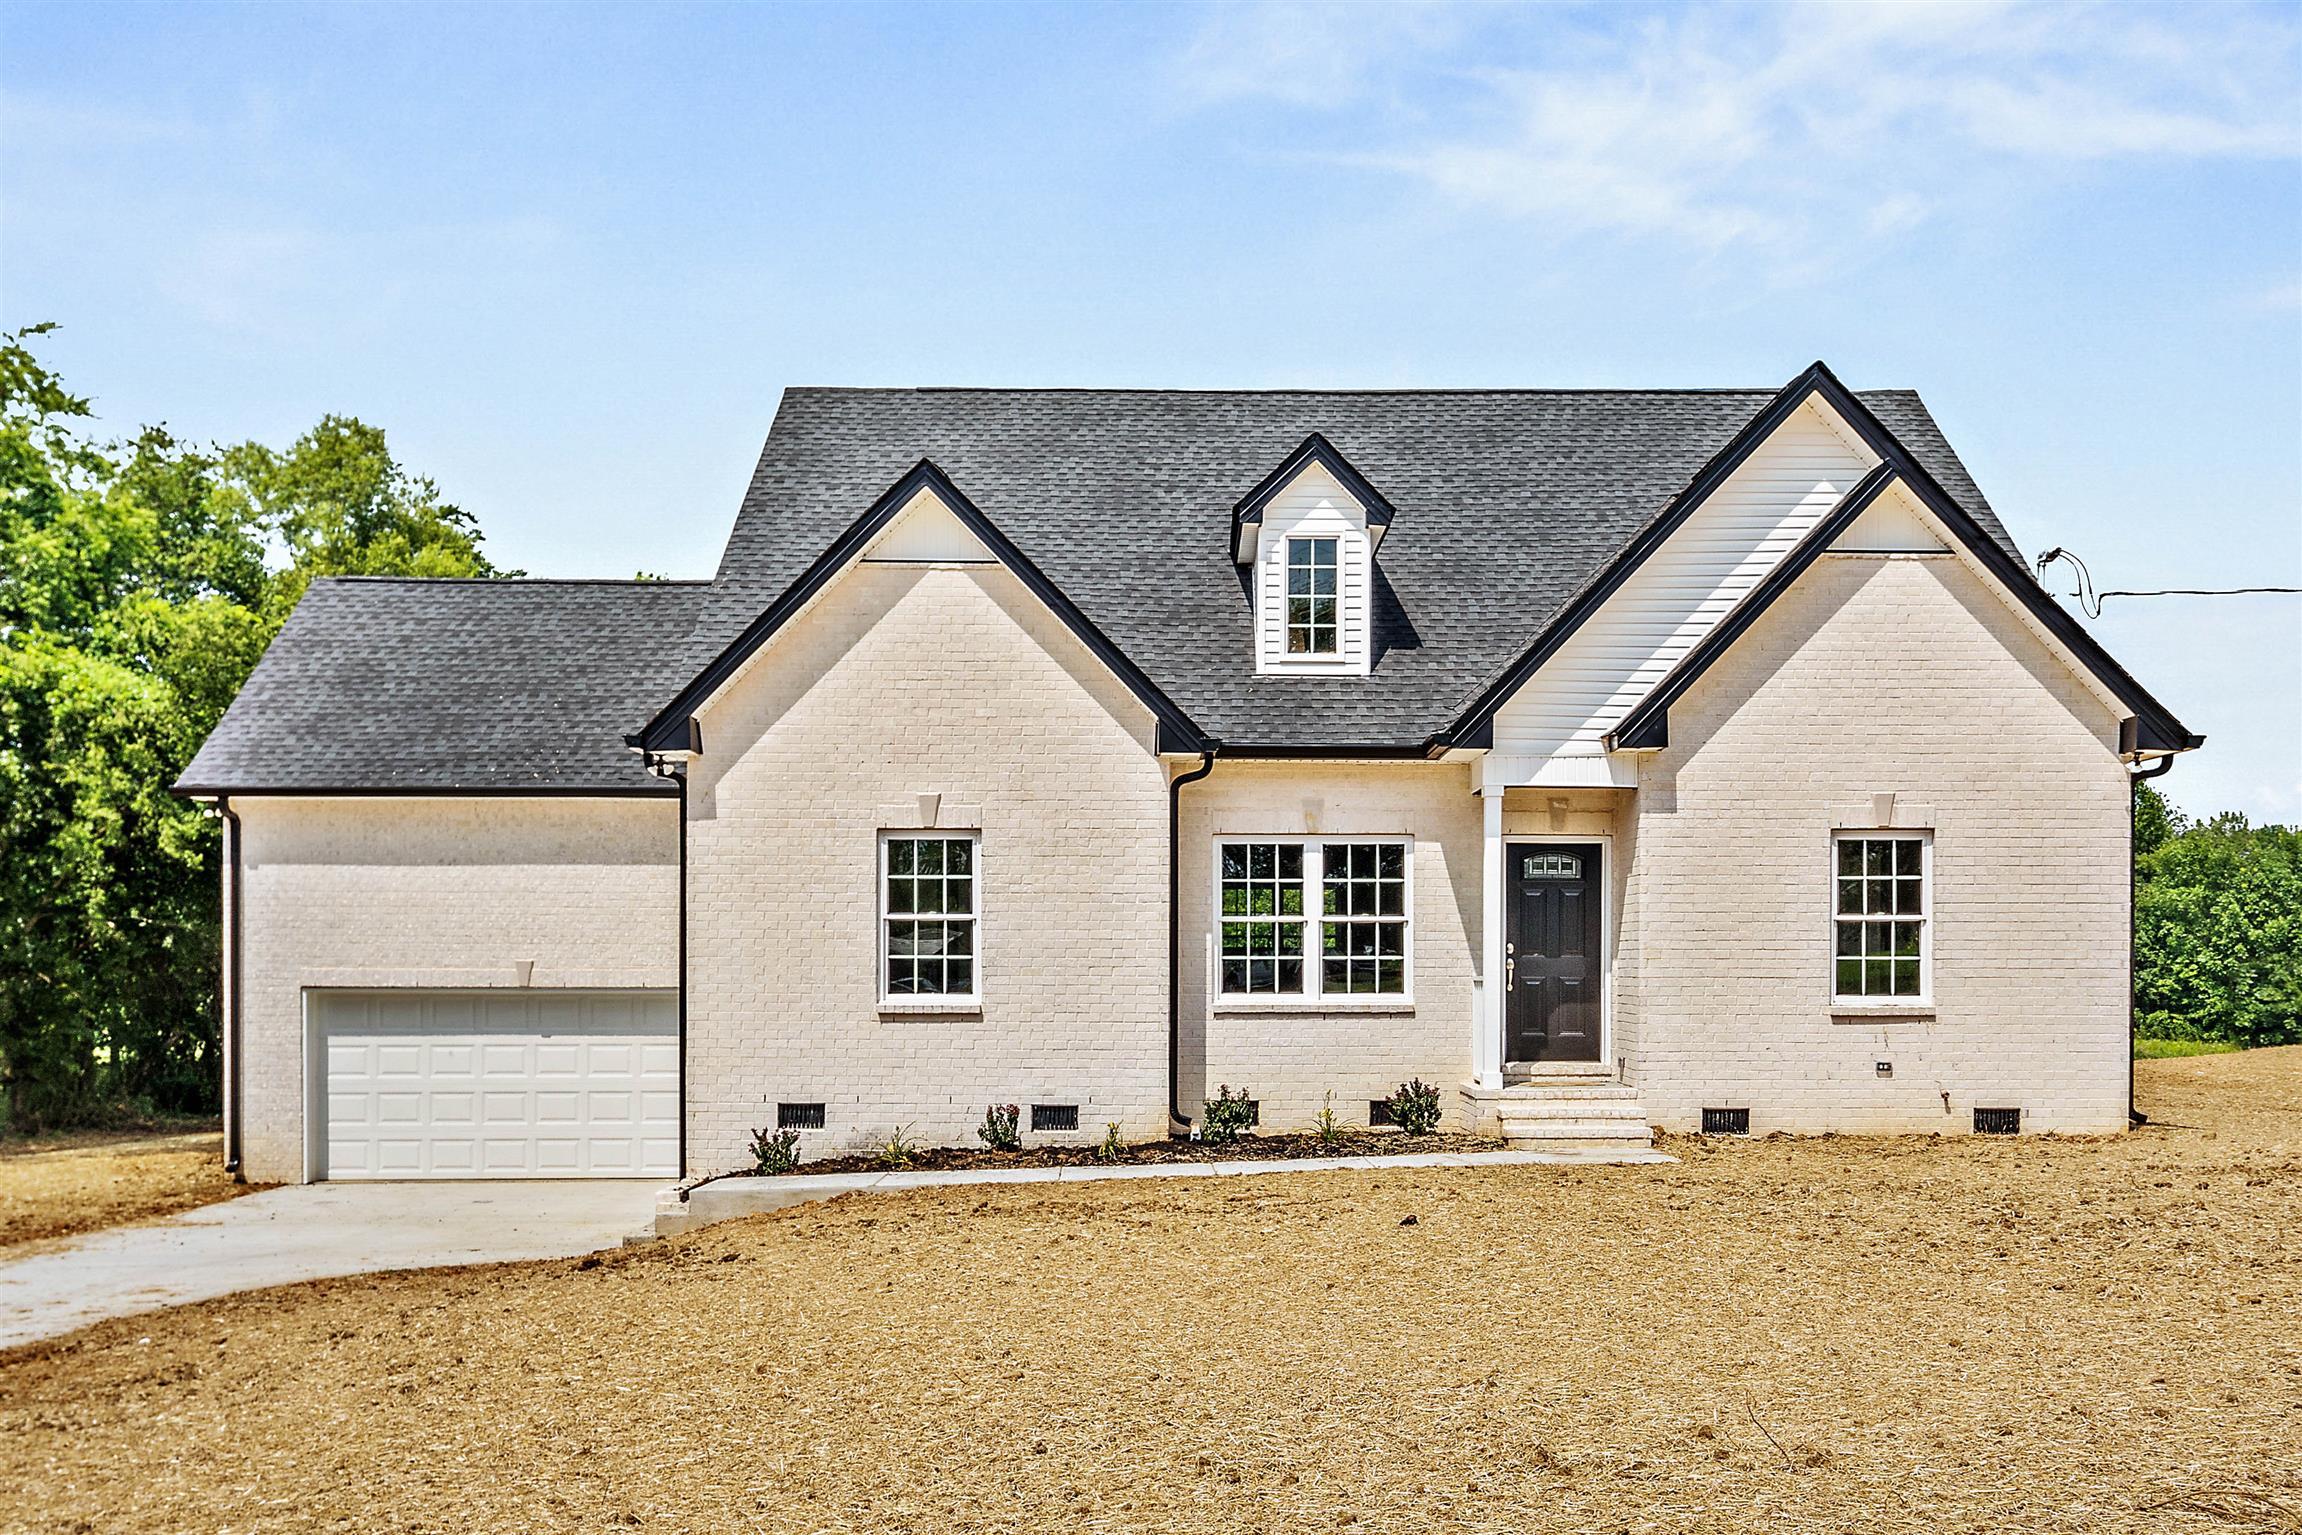 814 Coopertown Rd, Unionville, TN 37180 - Unionville, TN real estate listing